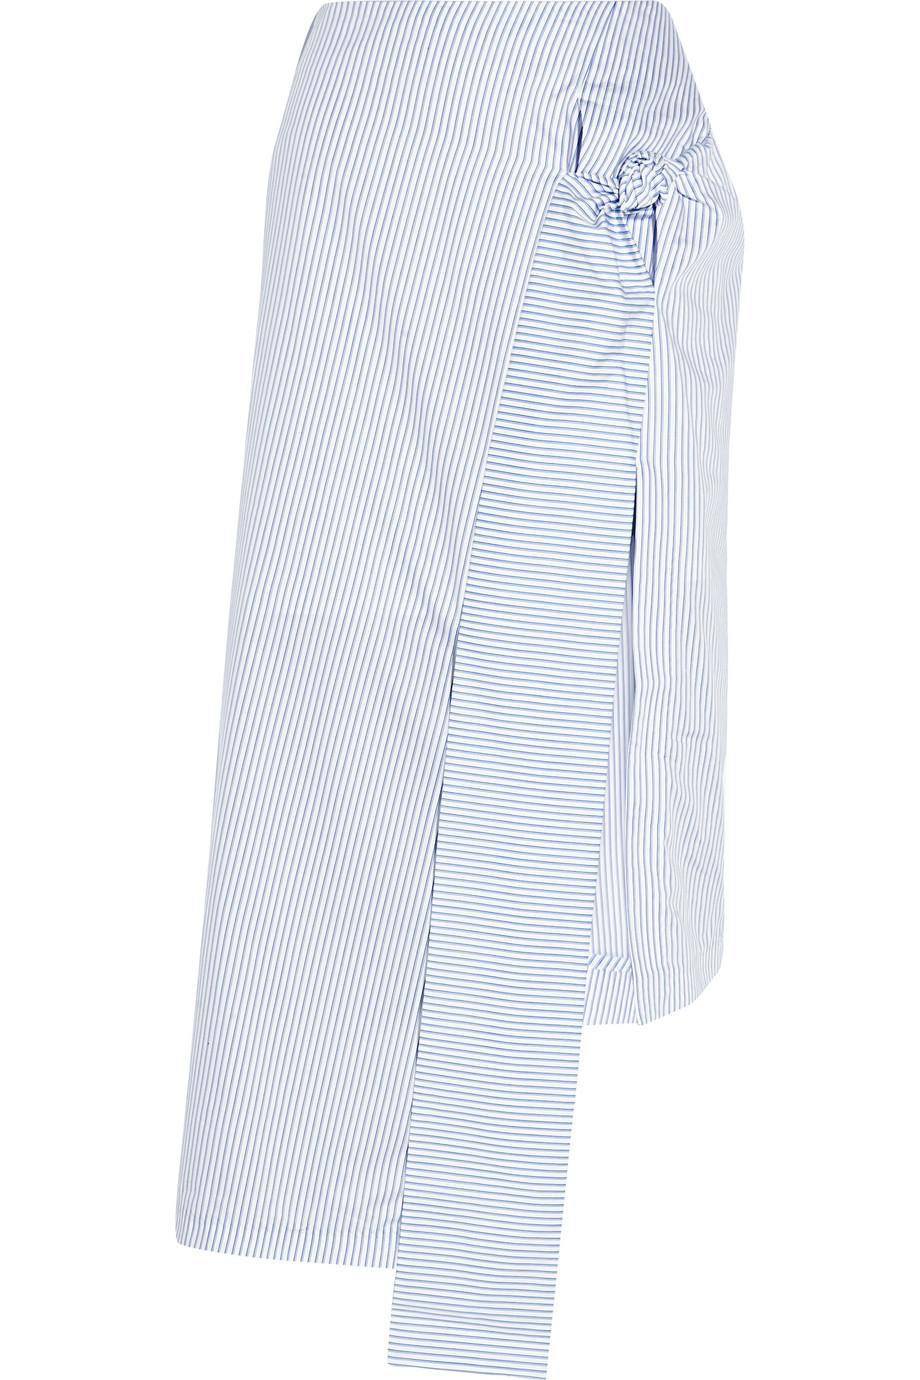 J.W.Anderson Knotted Striped Cotton-Poplin Skirt, Light Blue, Women's, Size: 12